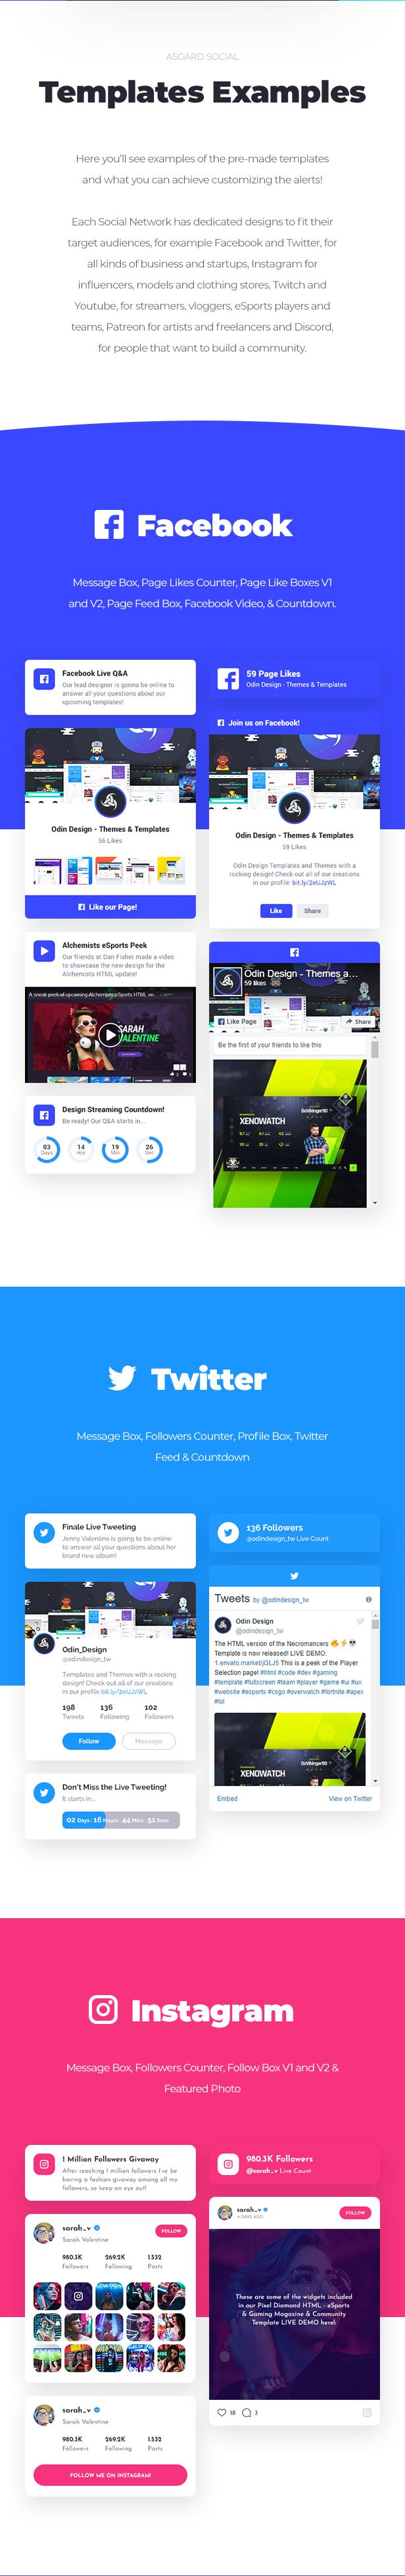 Asgard - Social Media Alerts & Feeds WordPress Builder - Facebook, Instagram, Twitch and more! - 12